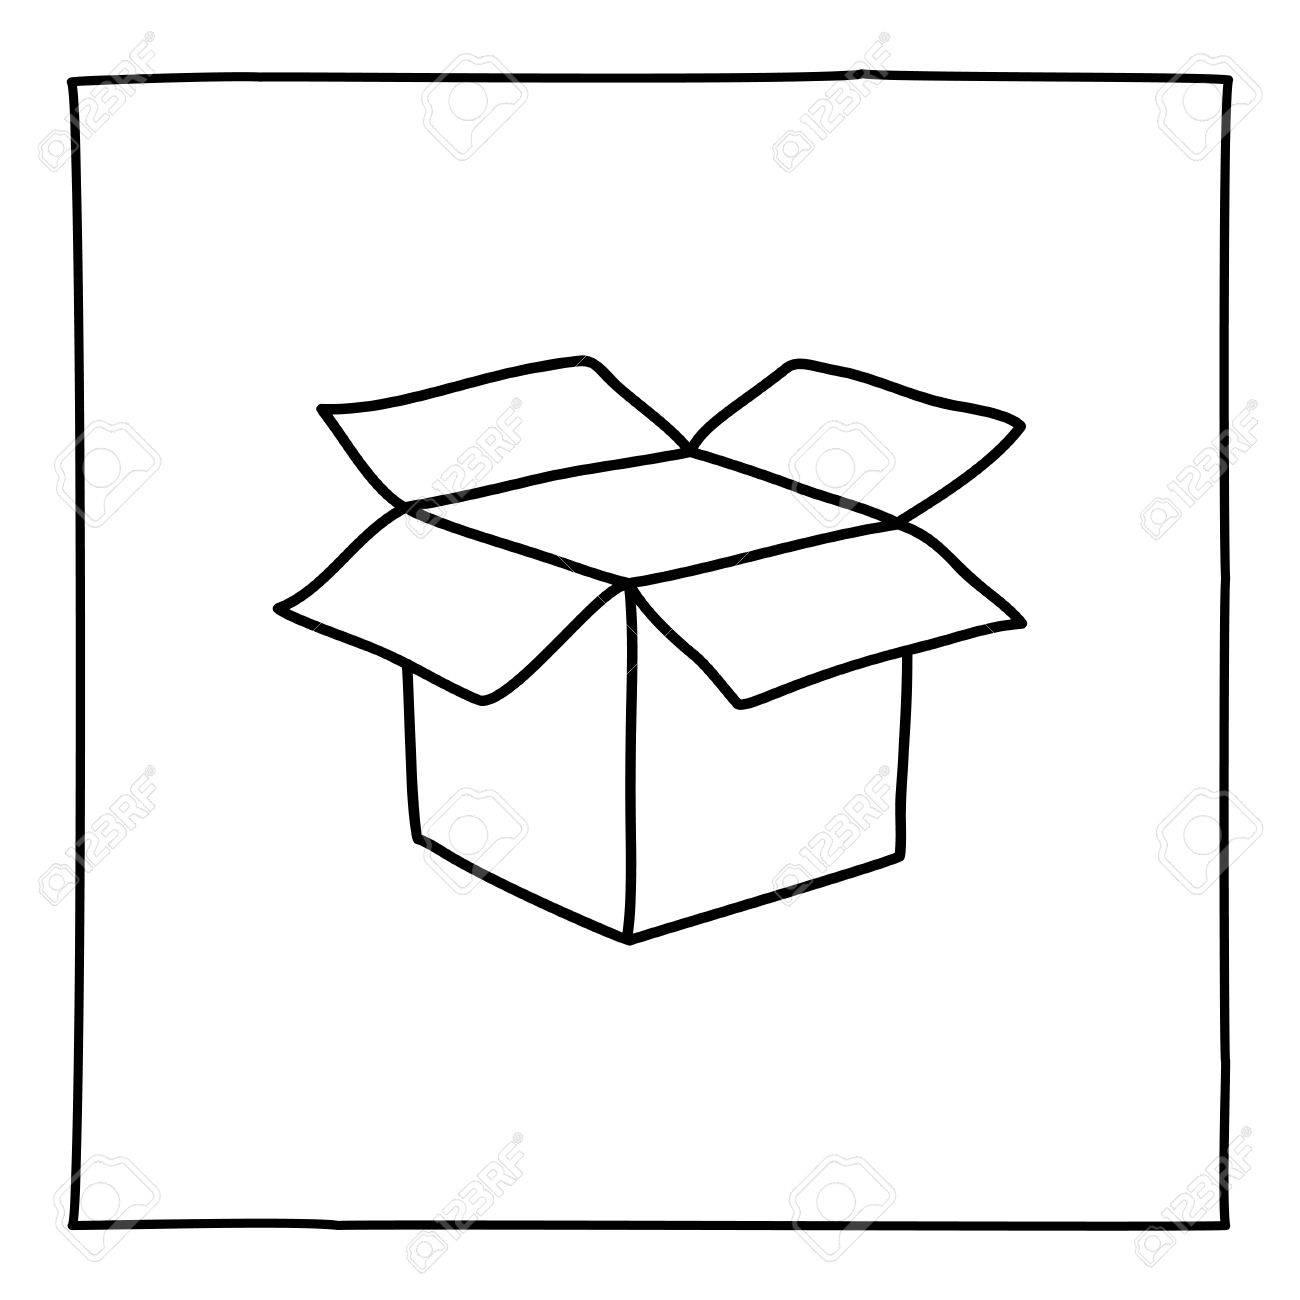 Doodle Open Box Icon. Zwart-wit Symbool Met Frame. Line Art Style ...